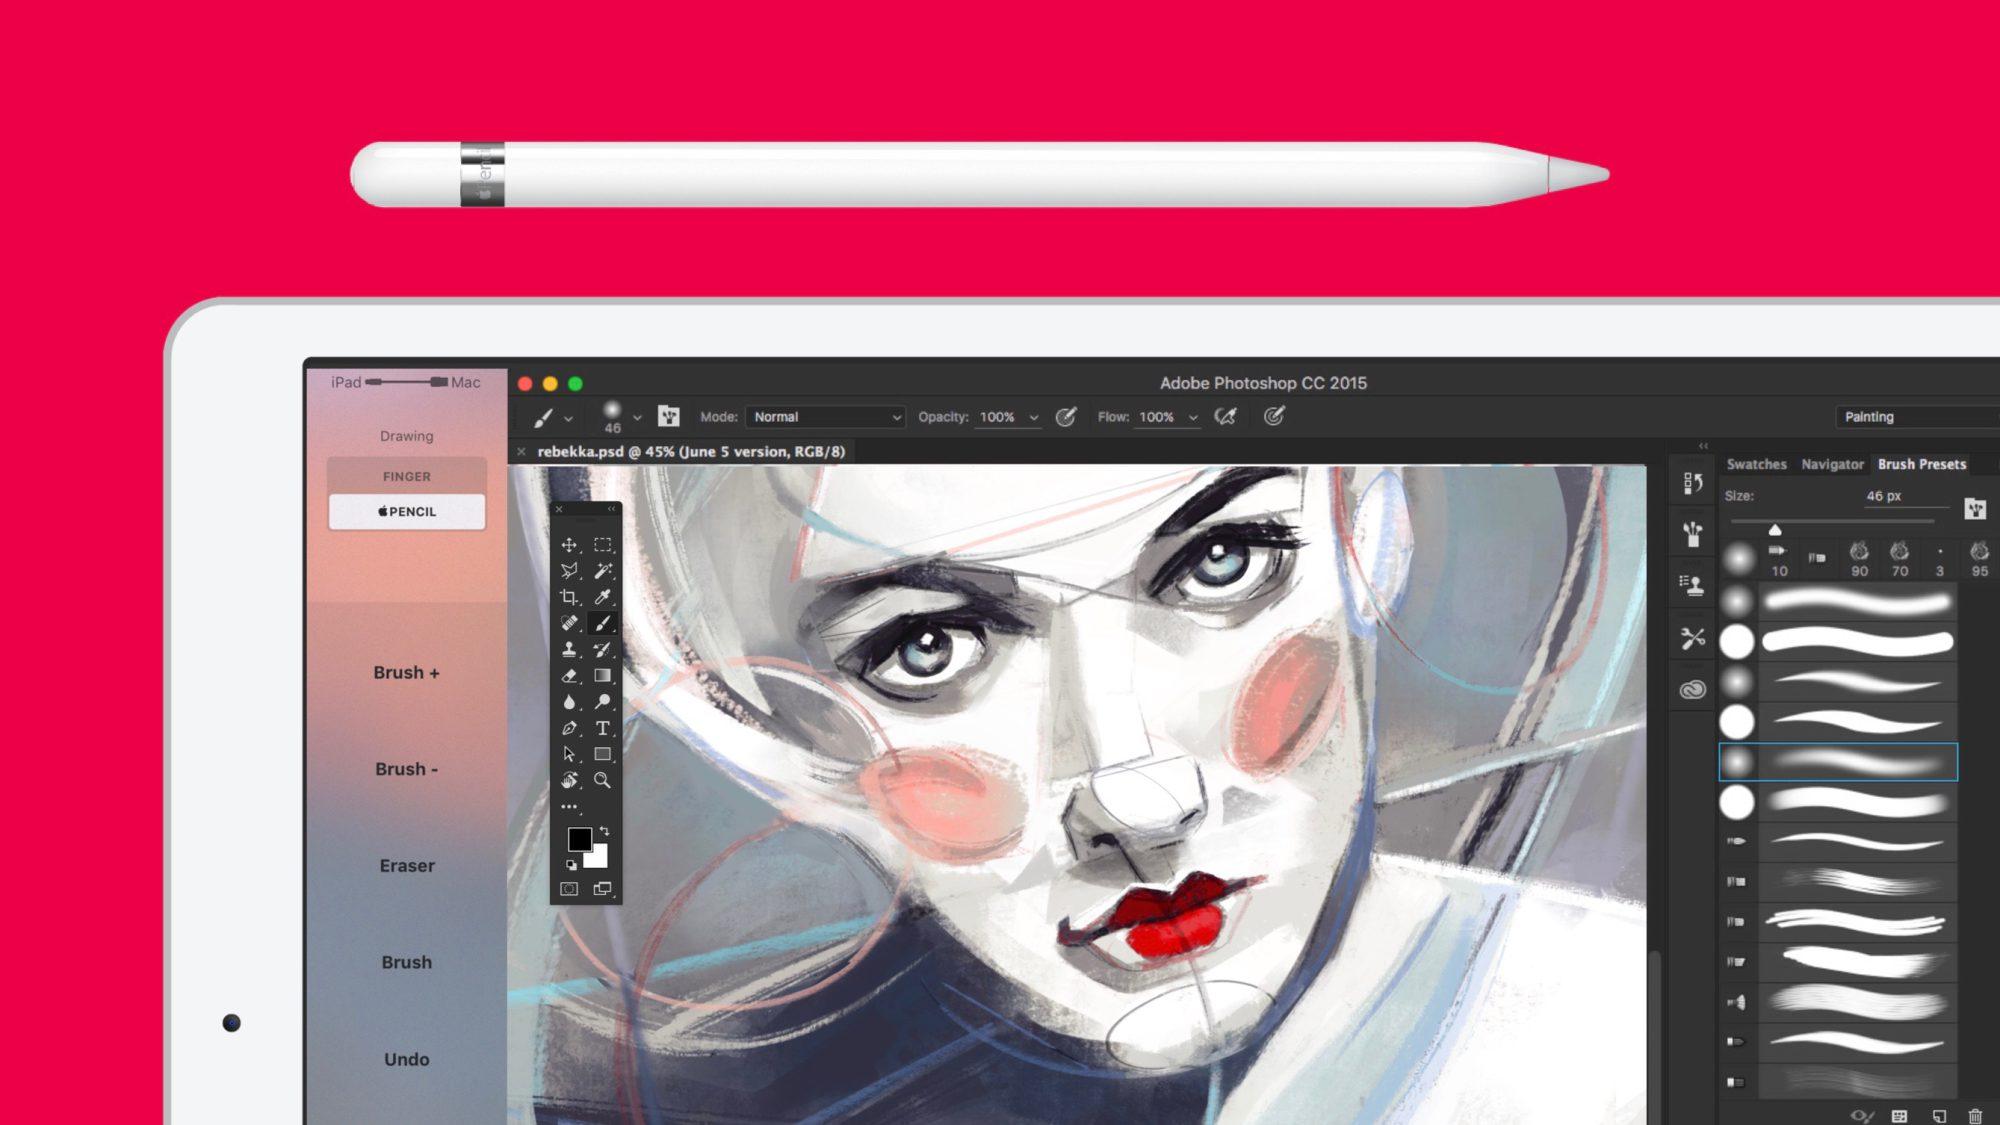 Character Design Ipad App : Astropad is a very useful ipad app that turns an ipad into